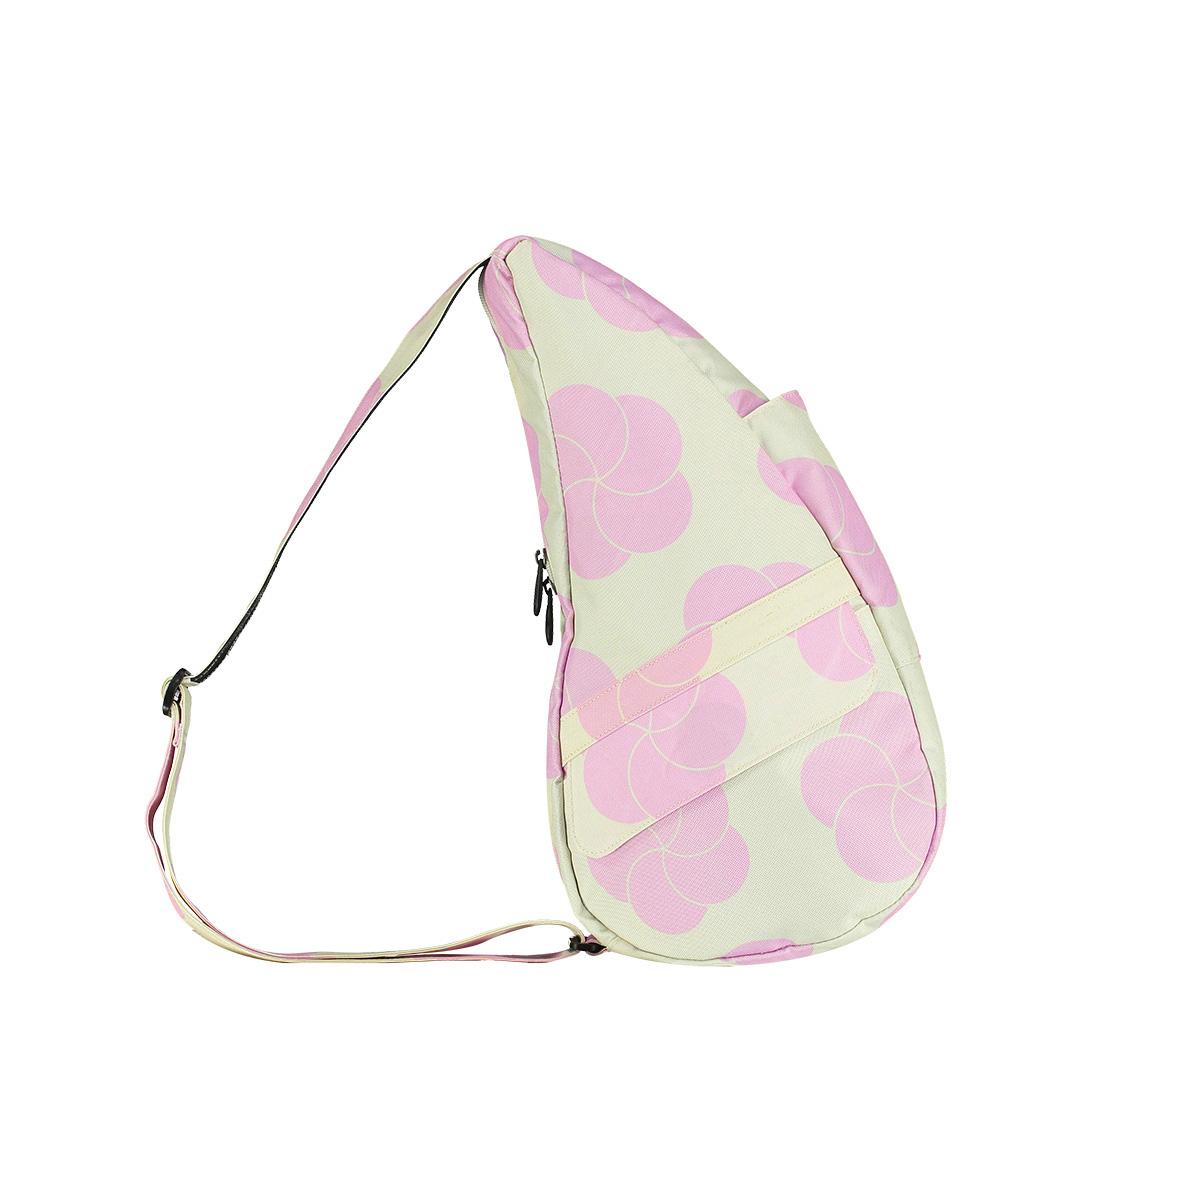 Healthy Back Bag/ヘルシーバックバッグ/ショルダーバッグ/ボディバッグ/旅行バッグ/軽量/レディース/メンズ 《限定ポーチ付》 公式ストア ヘルシーバックバッグ プリント Sサイズ ウメ